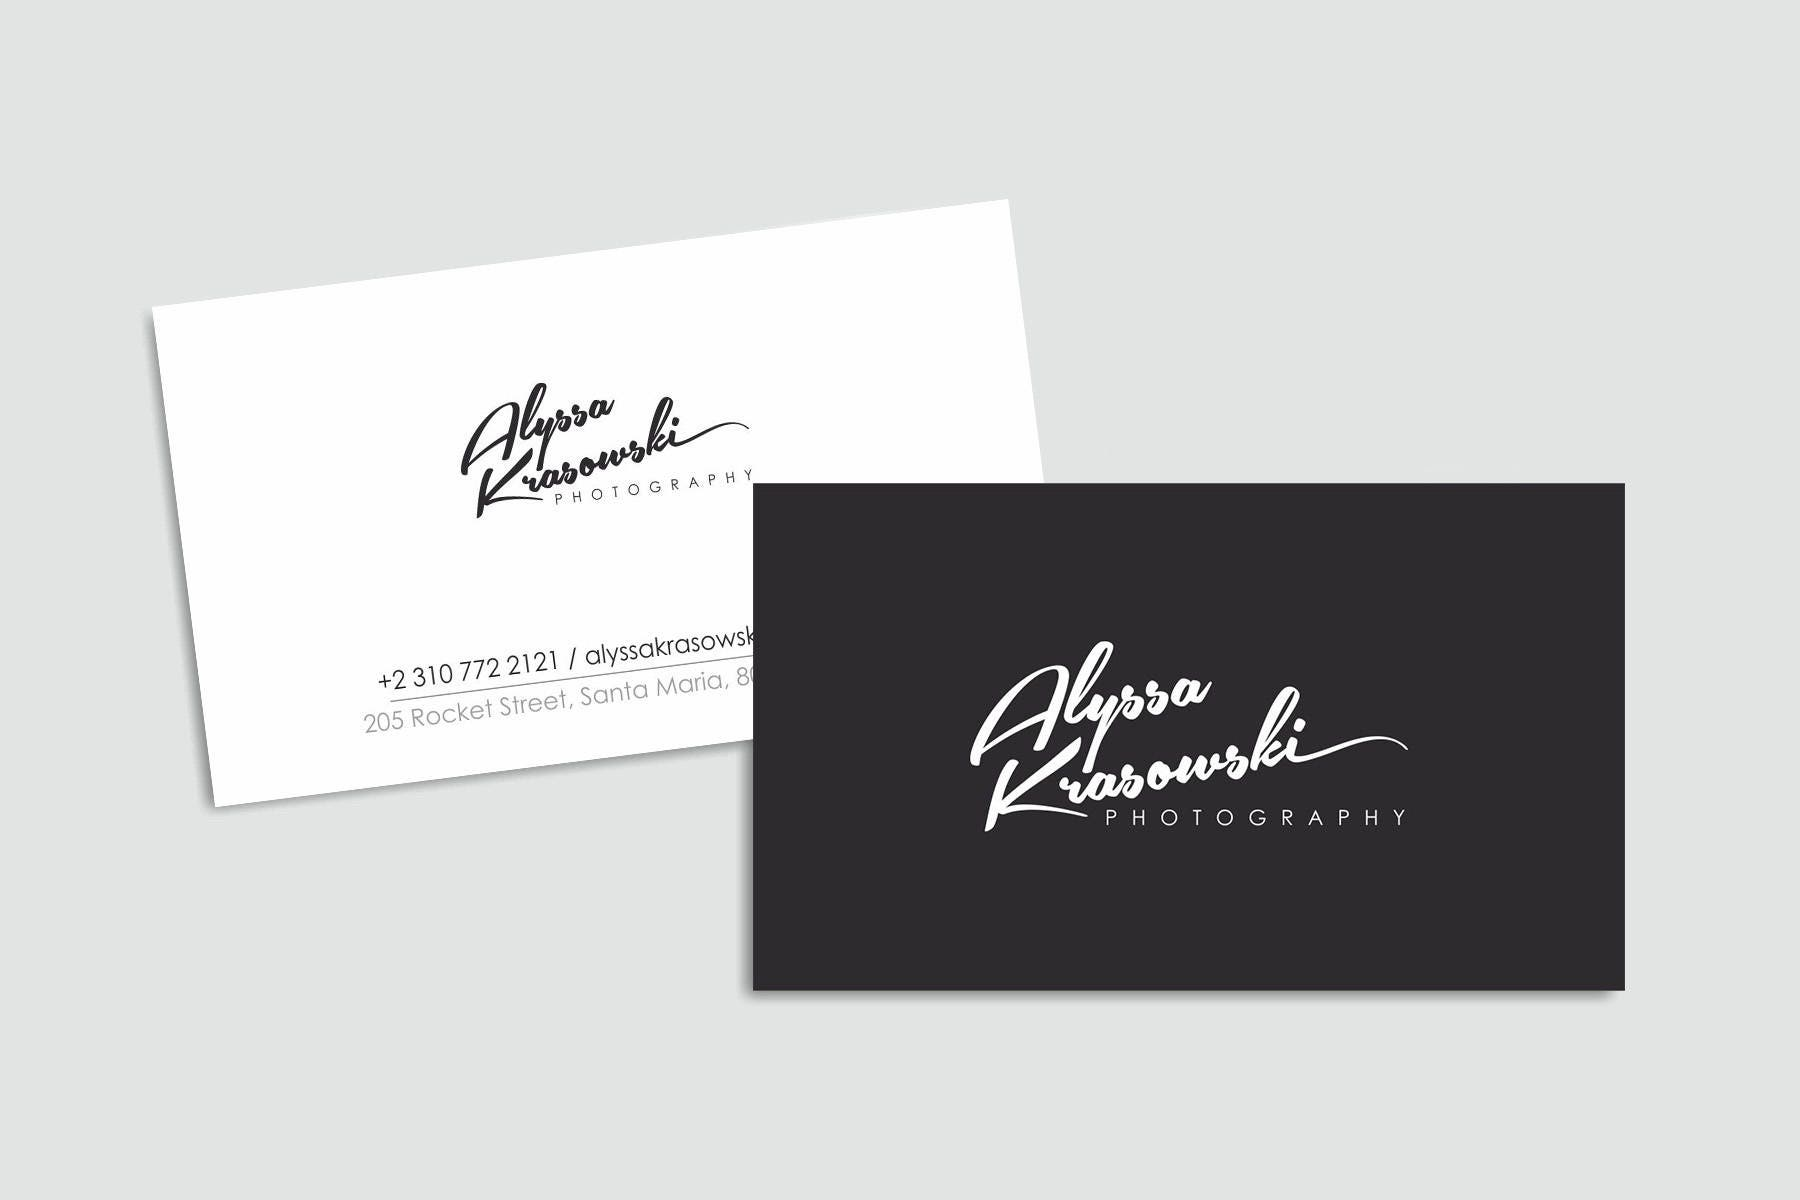 Signature photography calligraphy logo photography logo simple